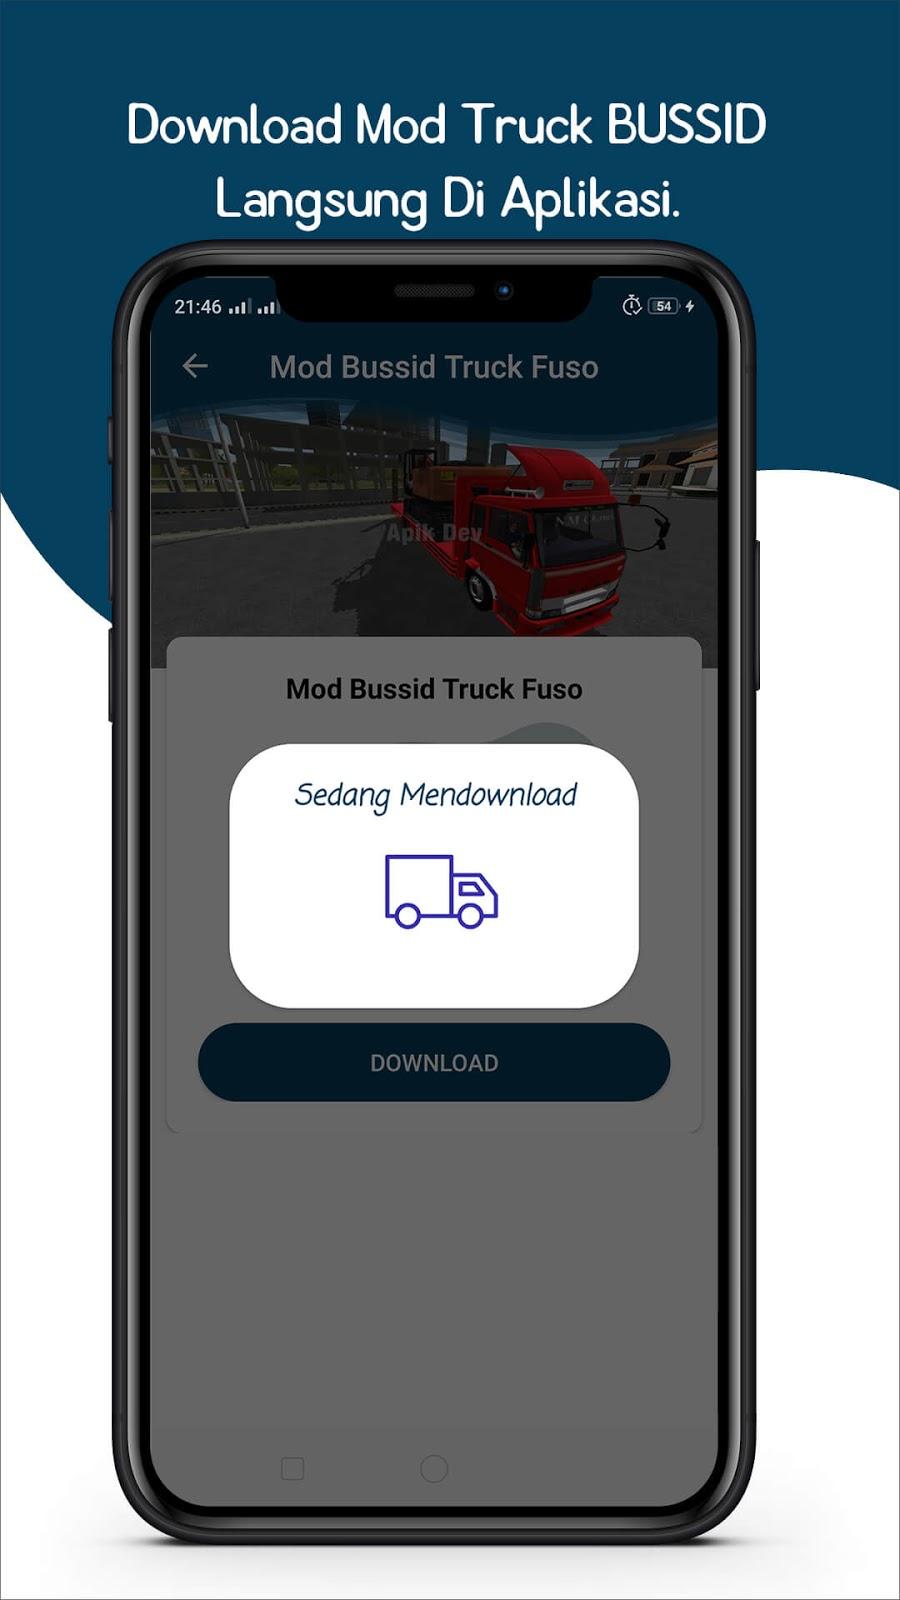 Download Aplikasi Kumpulan MOD BUSSID Terbaru